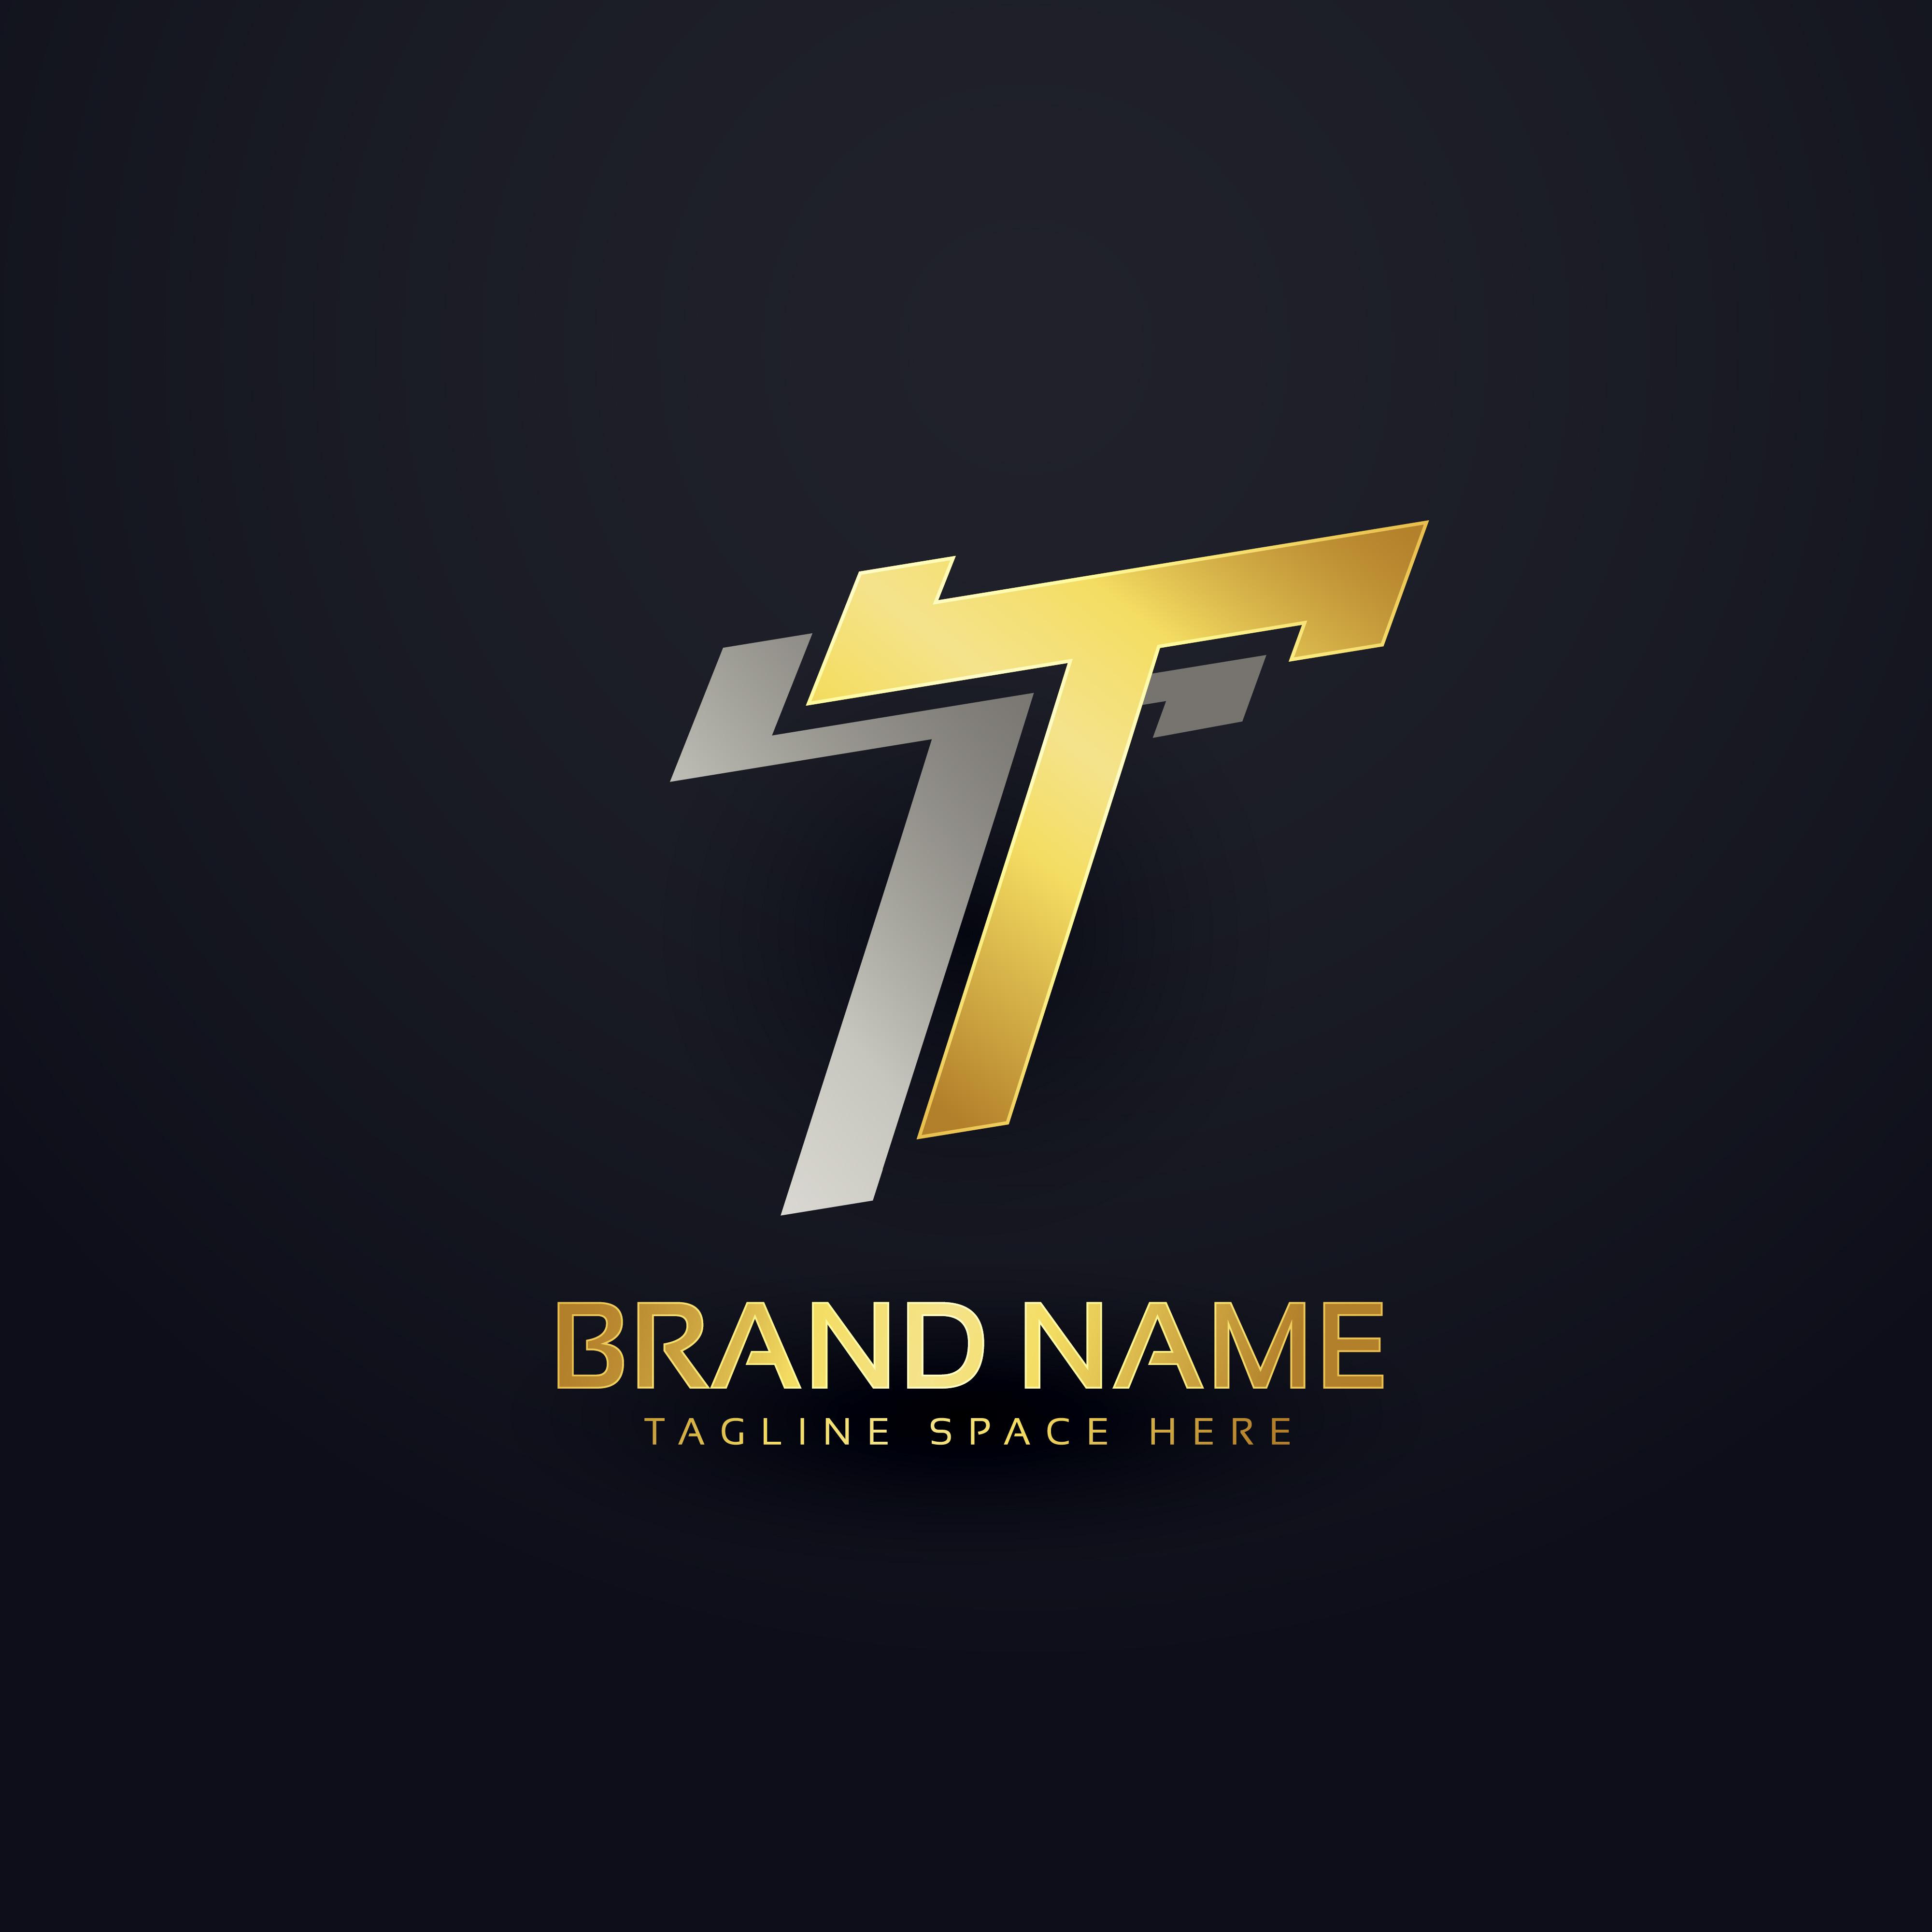 premium letter t logo concept background design download